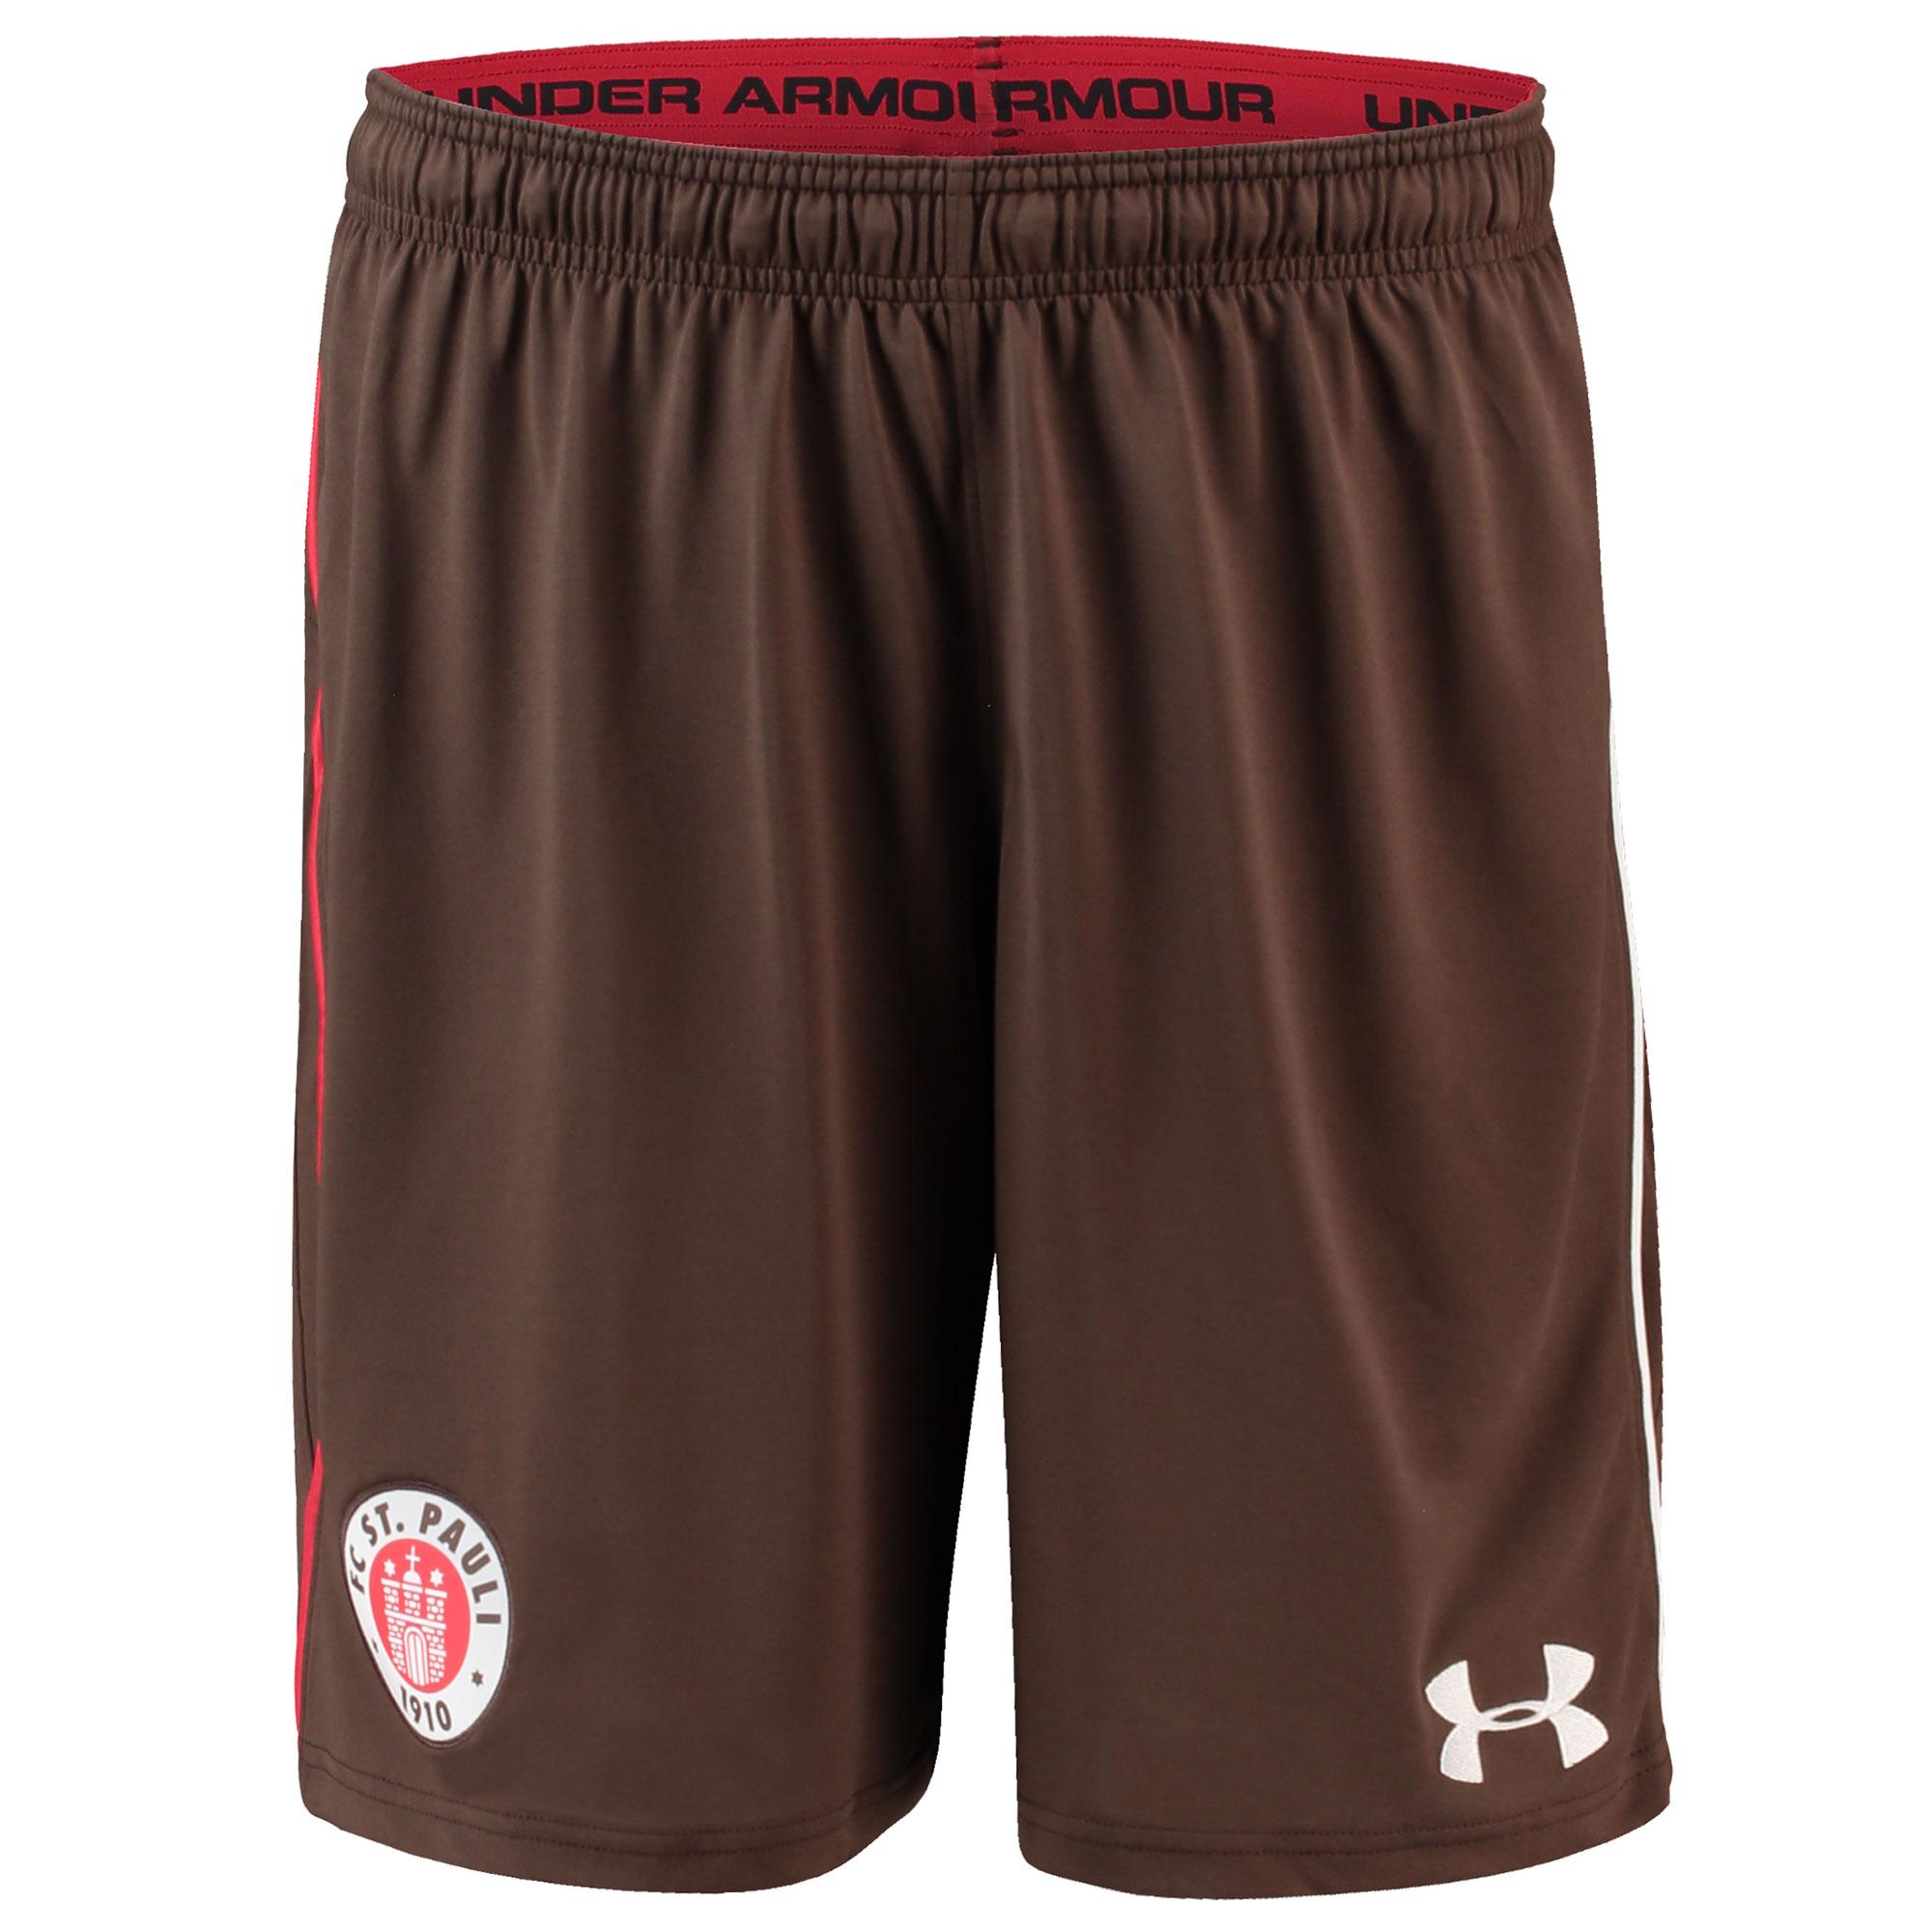 St Pauli Home Shorts 2018-19